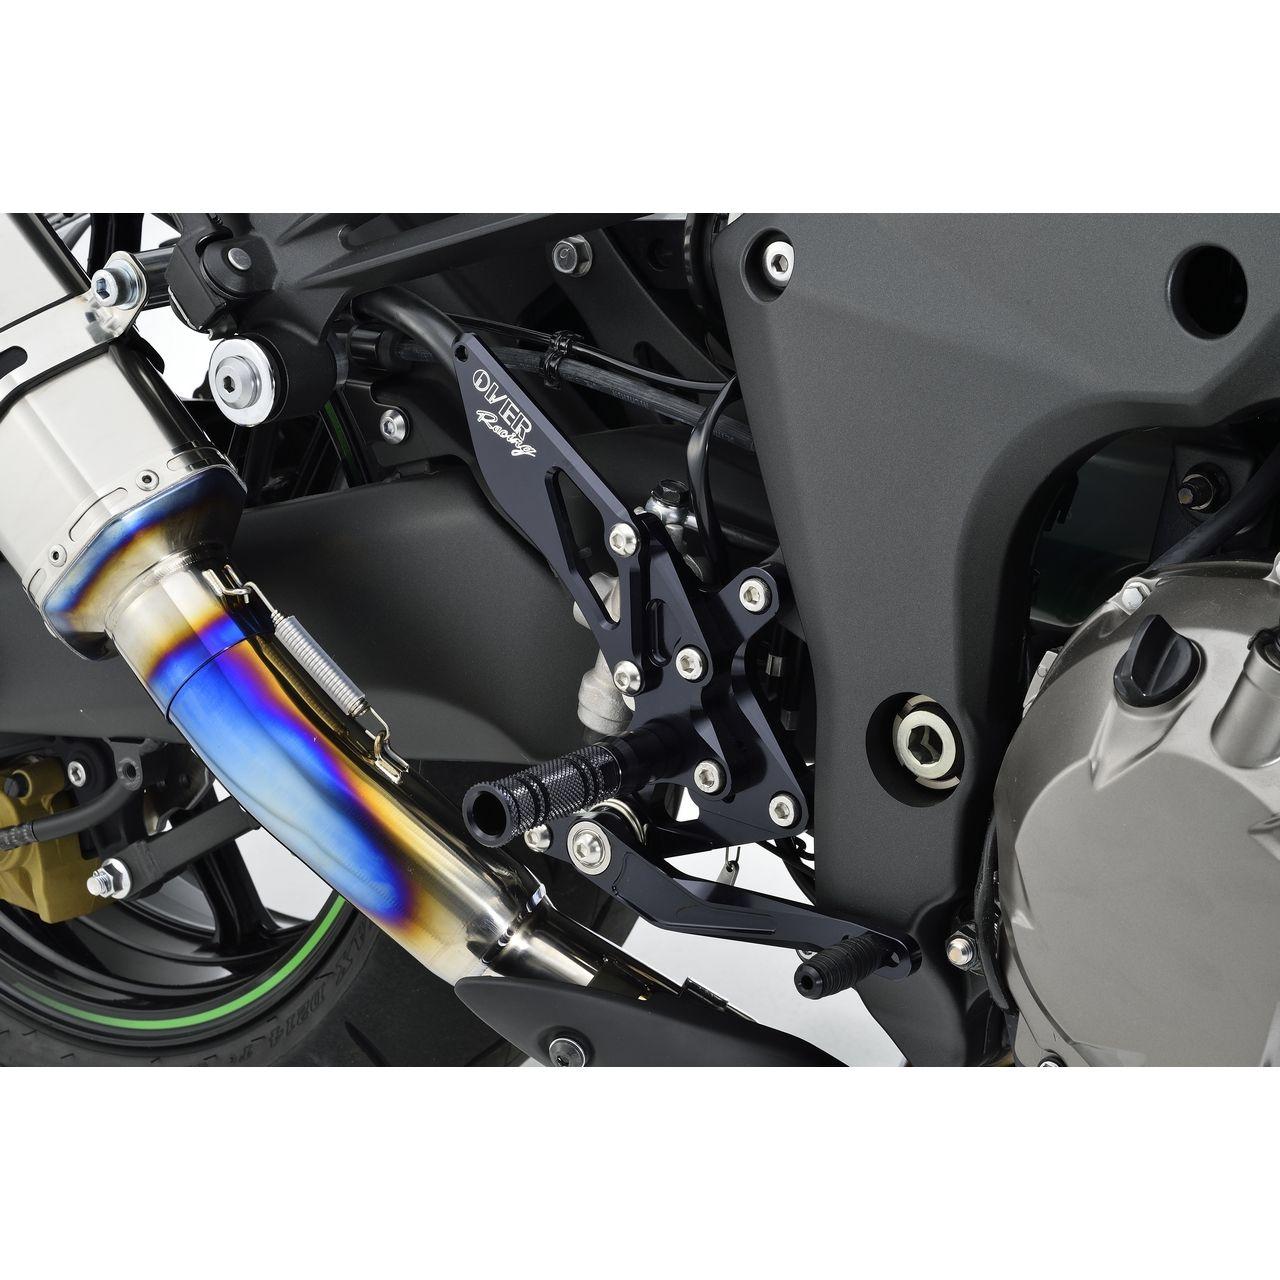 【OVER】腳踏後移套件4點安裝位置 - 「Webike-摩托百貨」